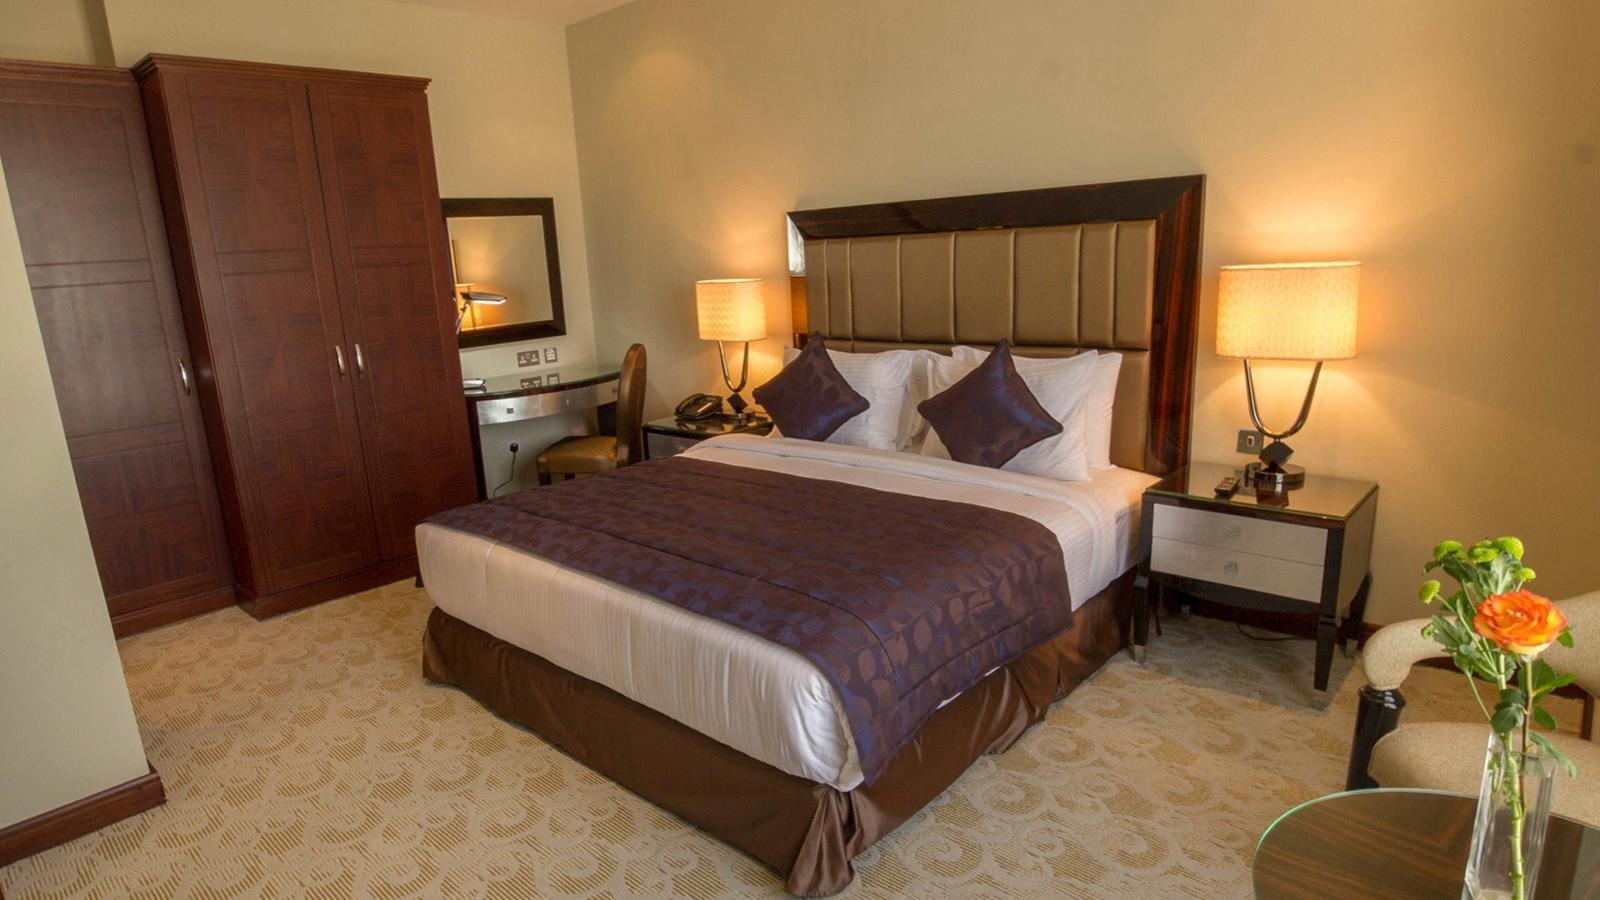 Executive Suites offer details